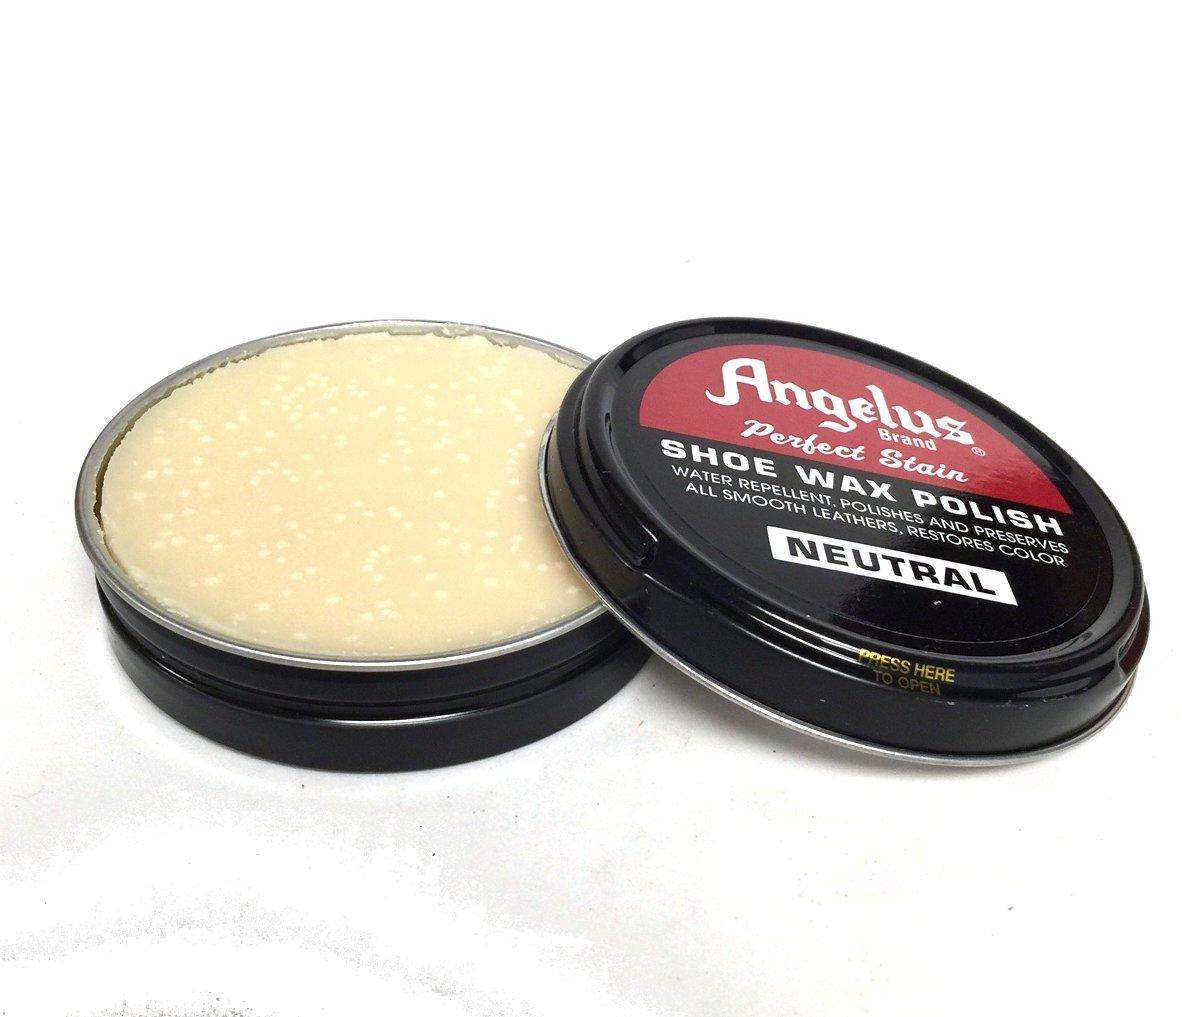 Angelus Perfect Stain SHoe Wax Polish, 2.6oz (Neutral)